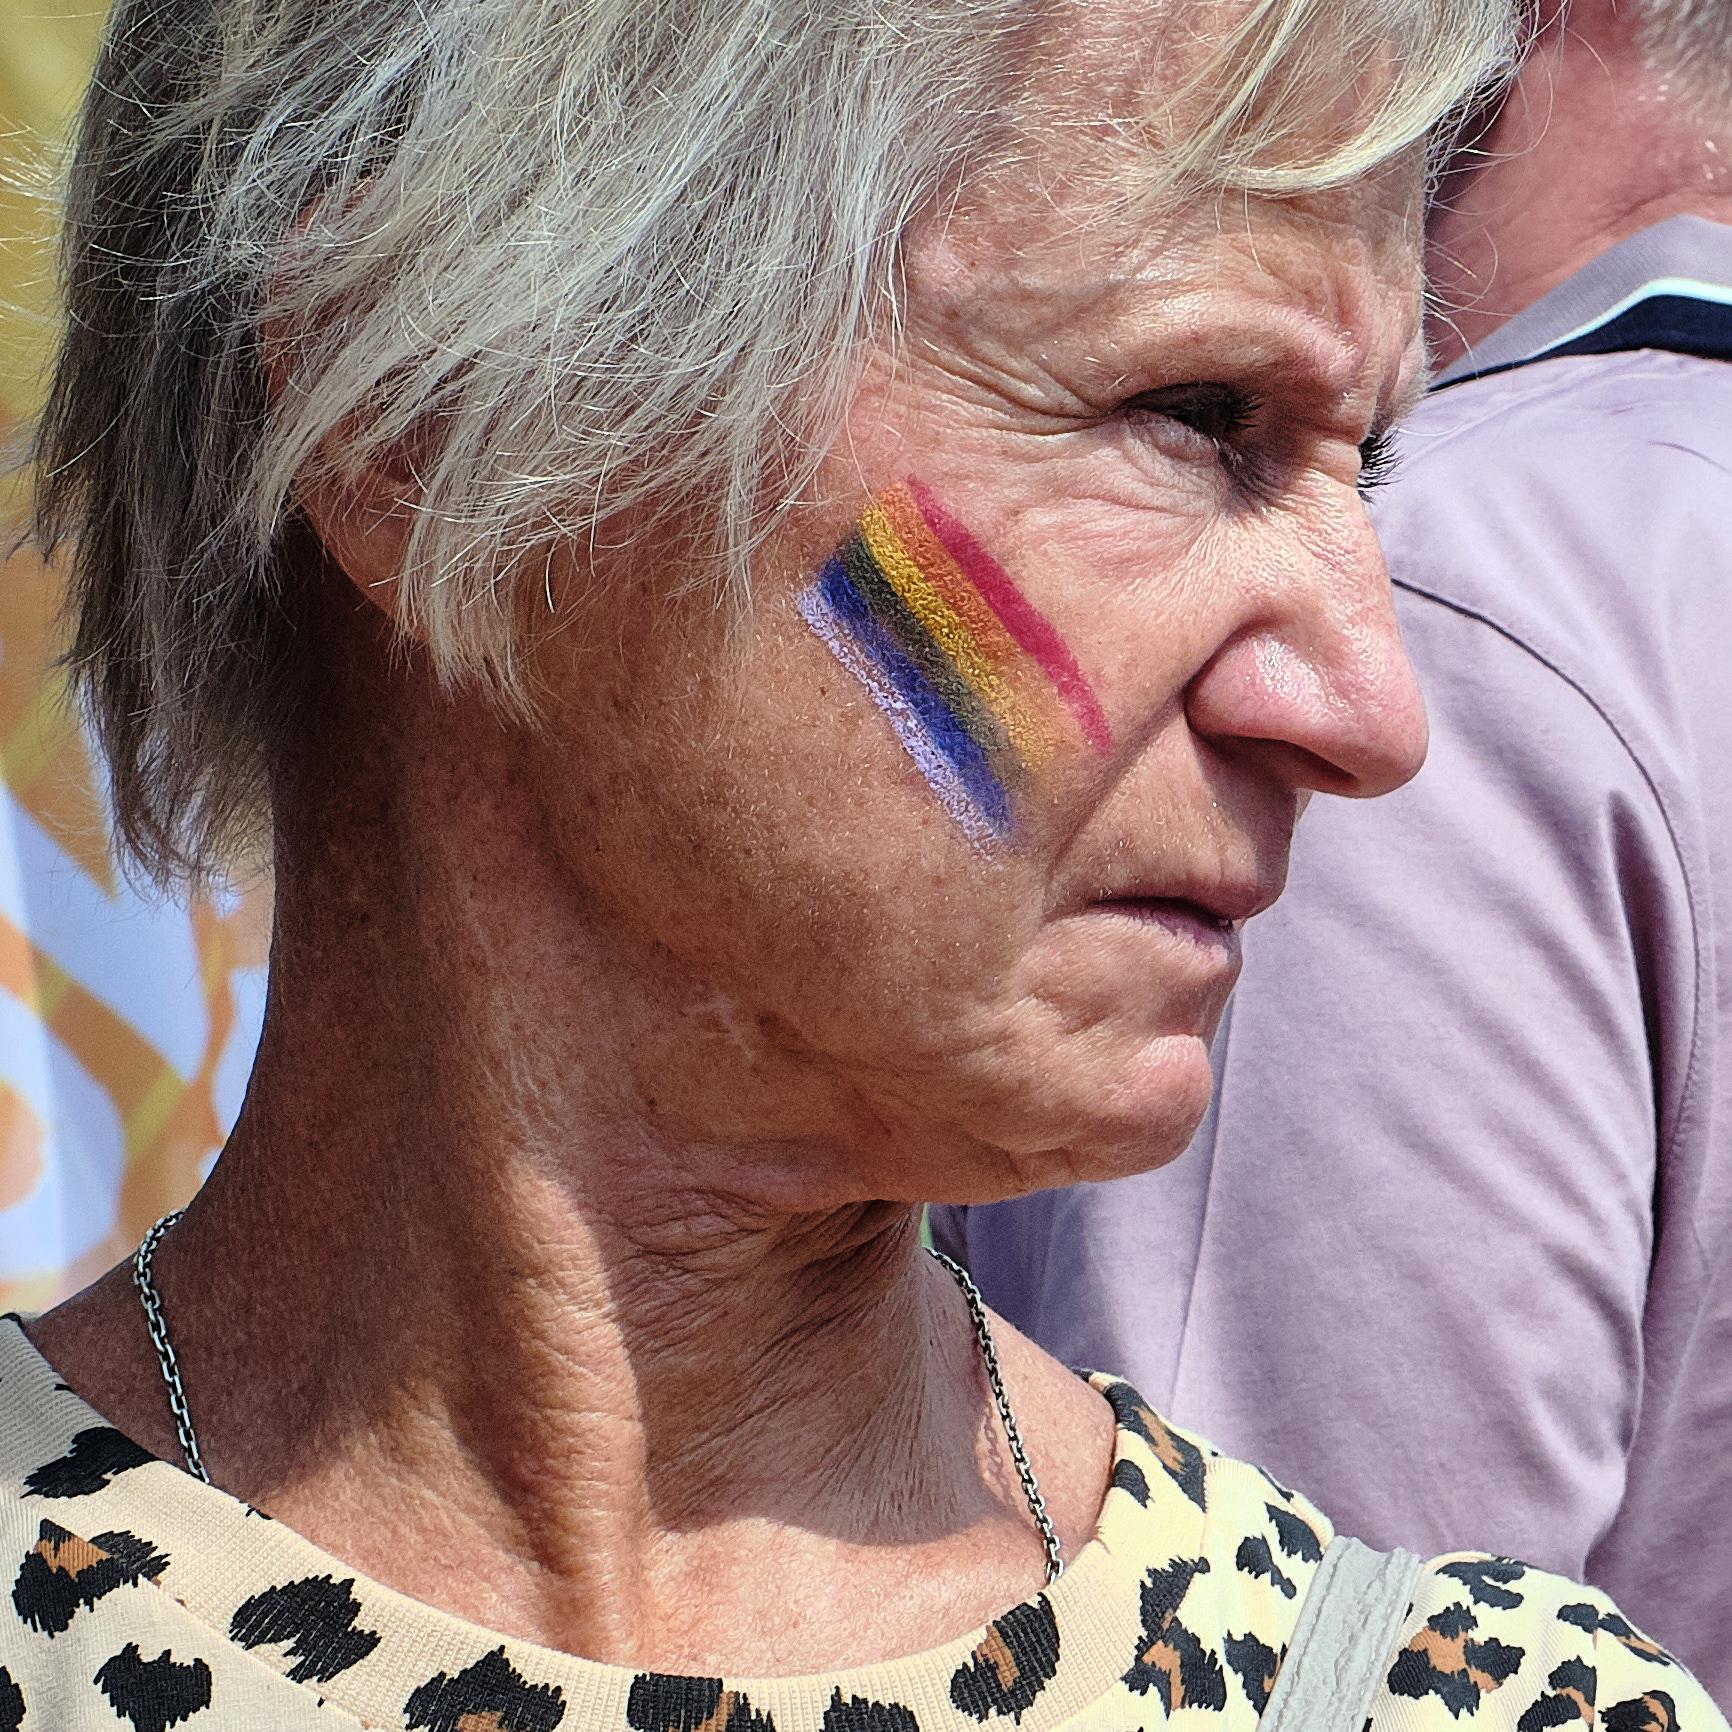 Amsterdam Pride 2019 is here...